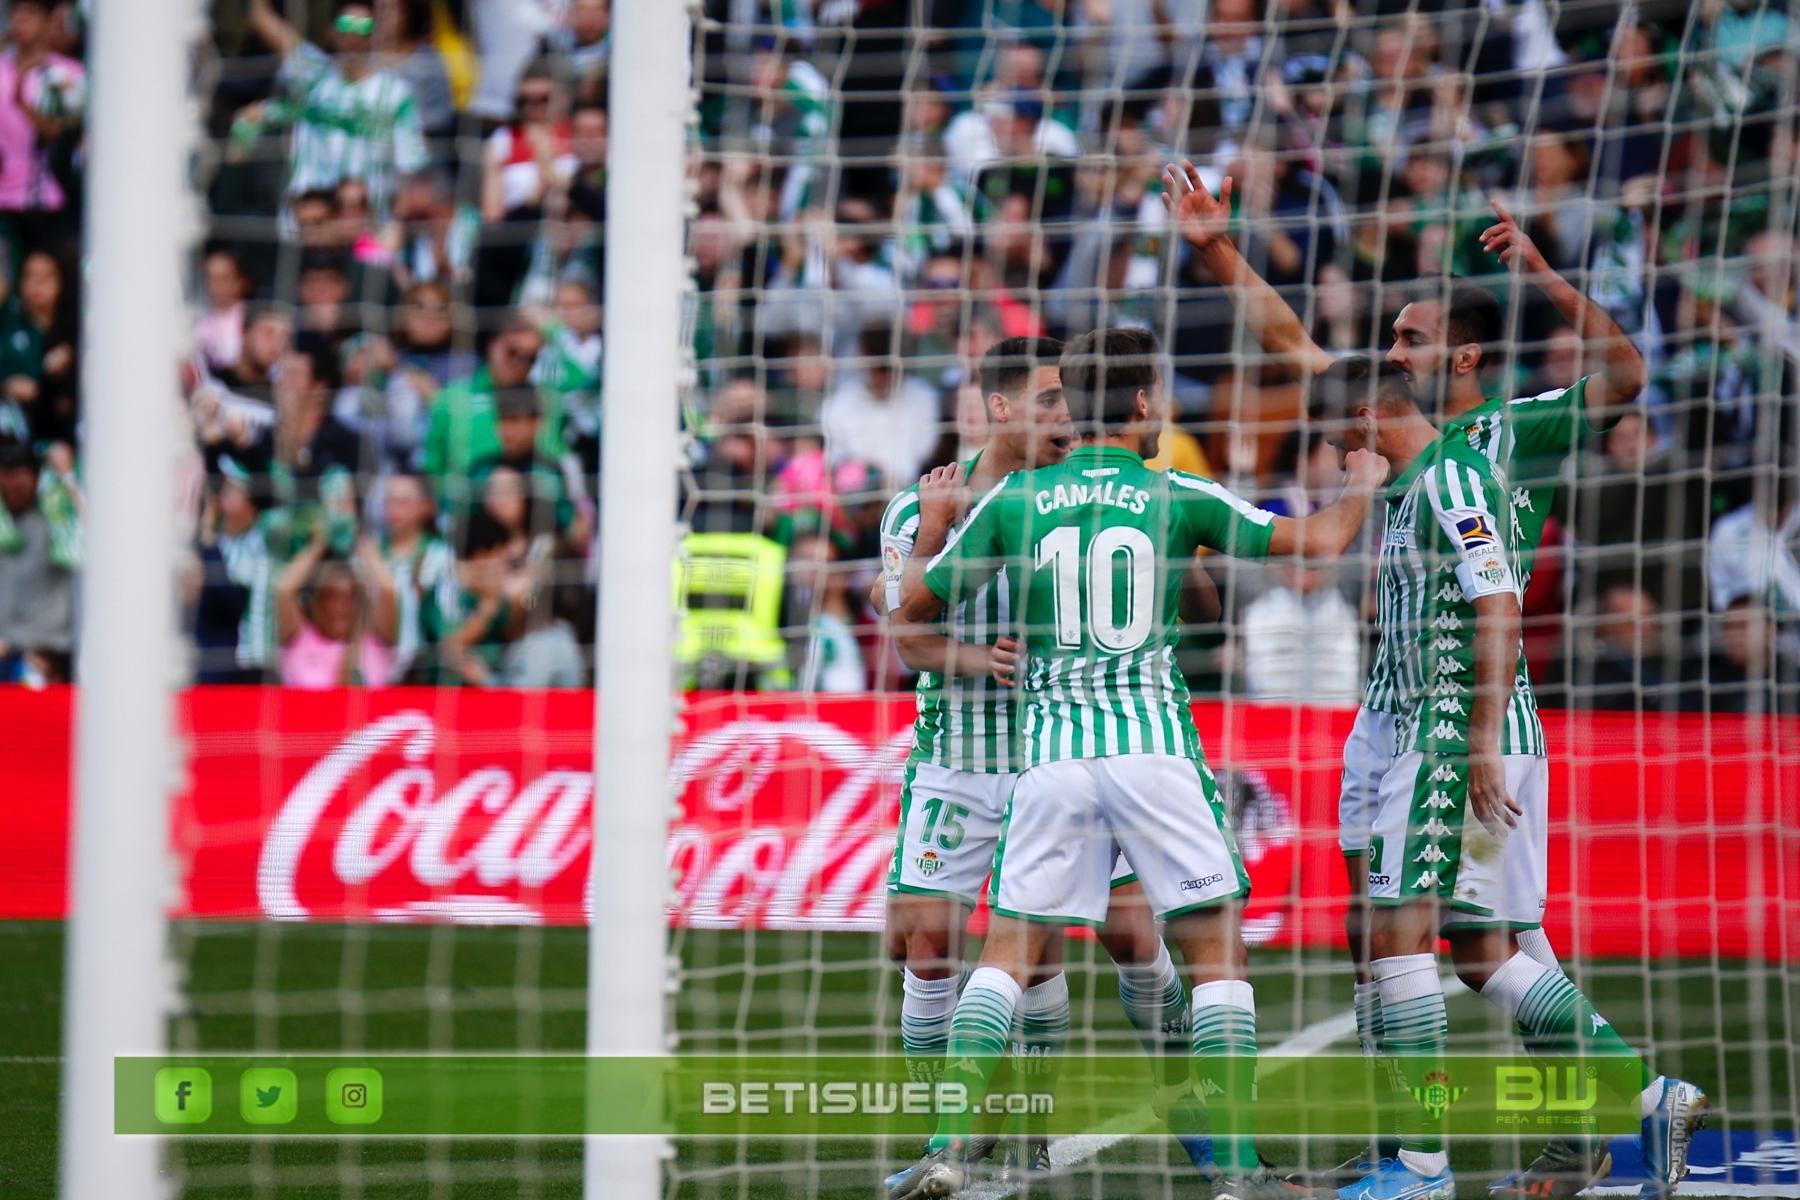 aJ20 Real Betis - Real Sociedad 27